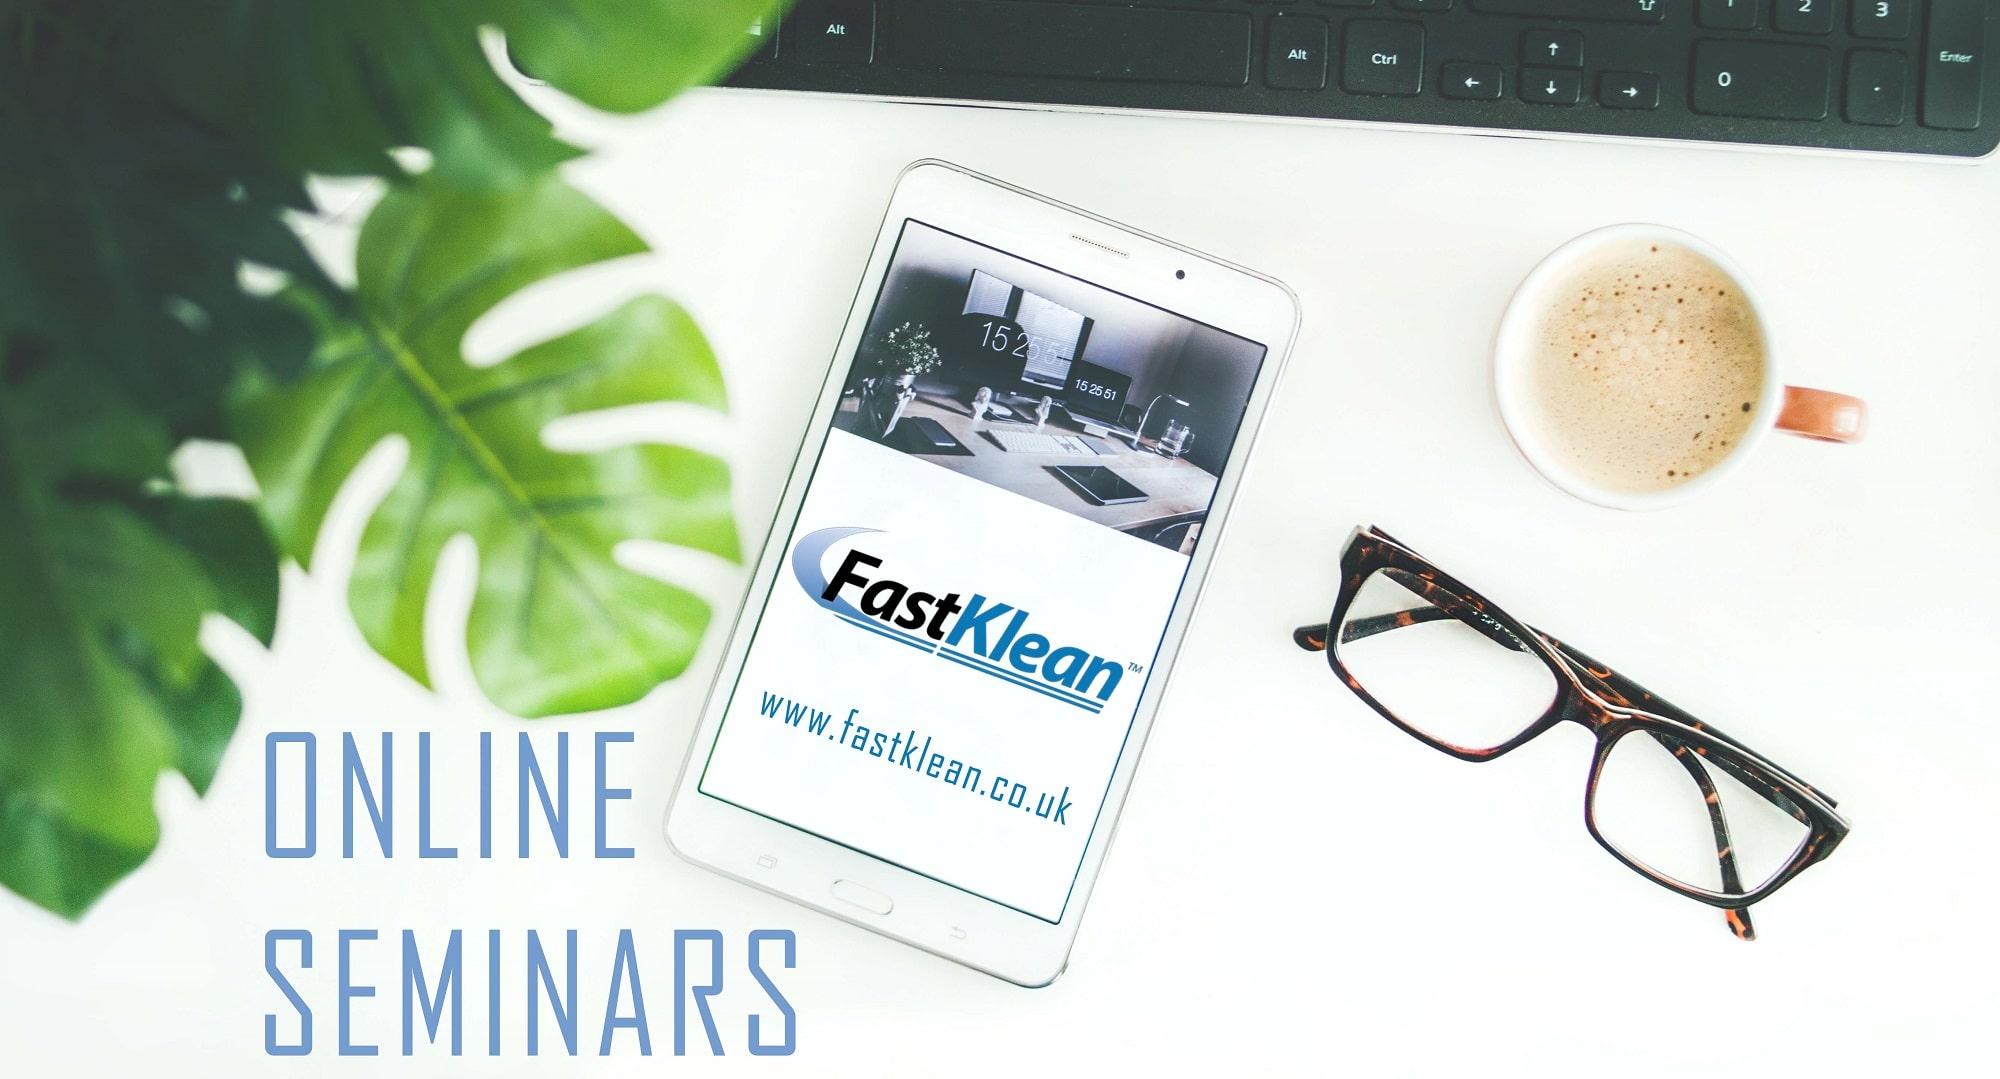 Online Seminars Fastklean2